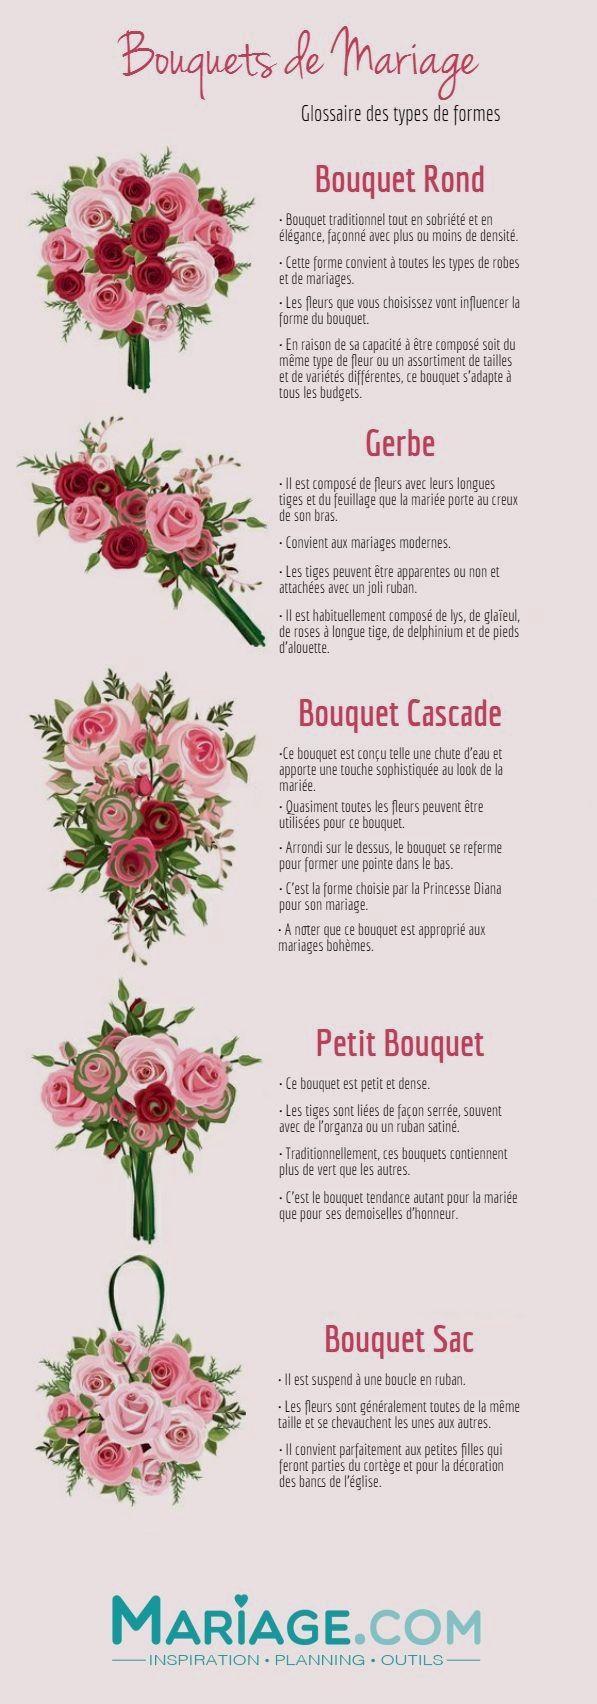 best weddings bouquets images on pinterest wedding bouquets